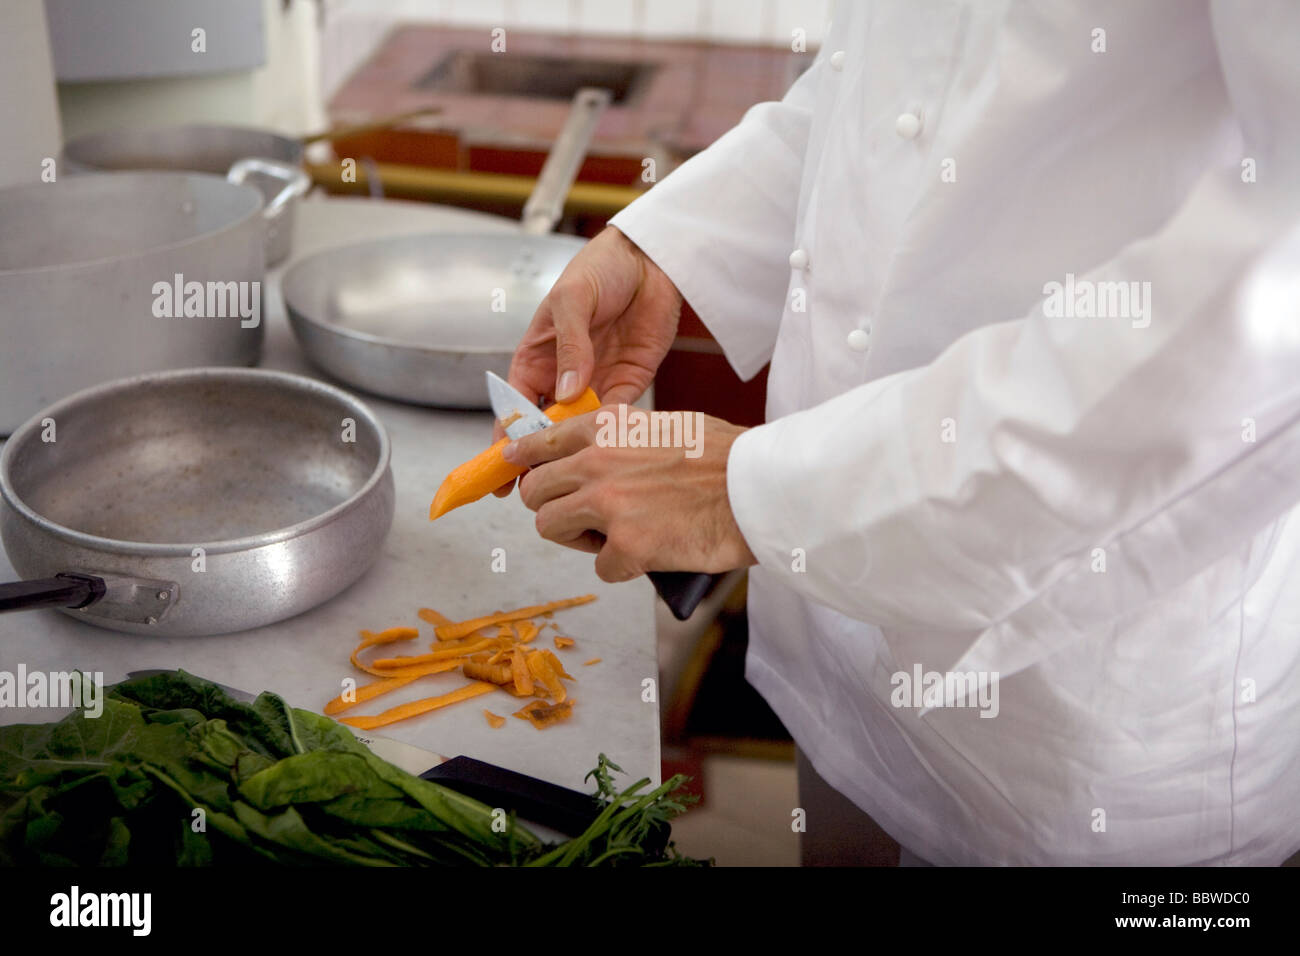 Bbw carrot play